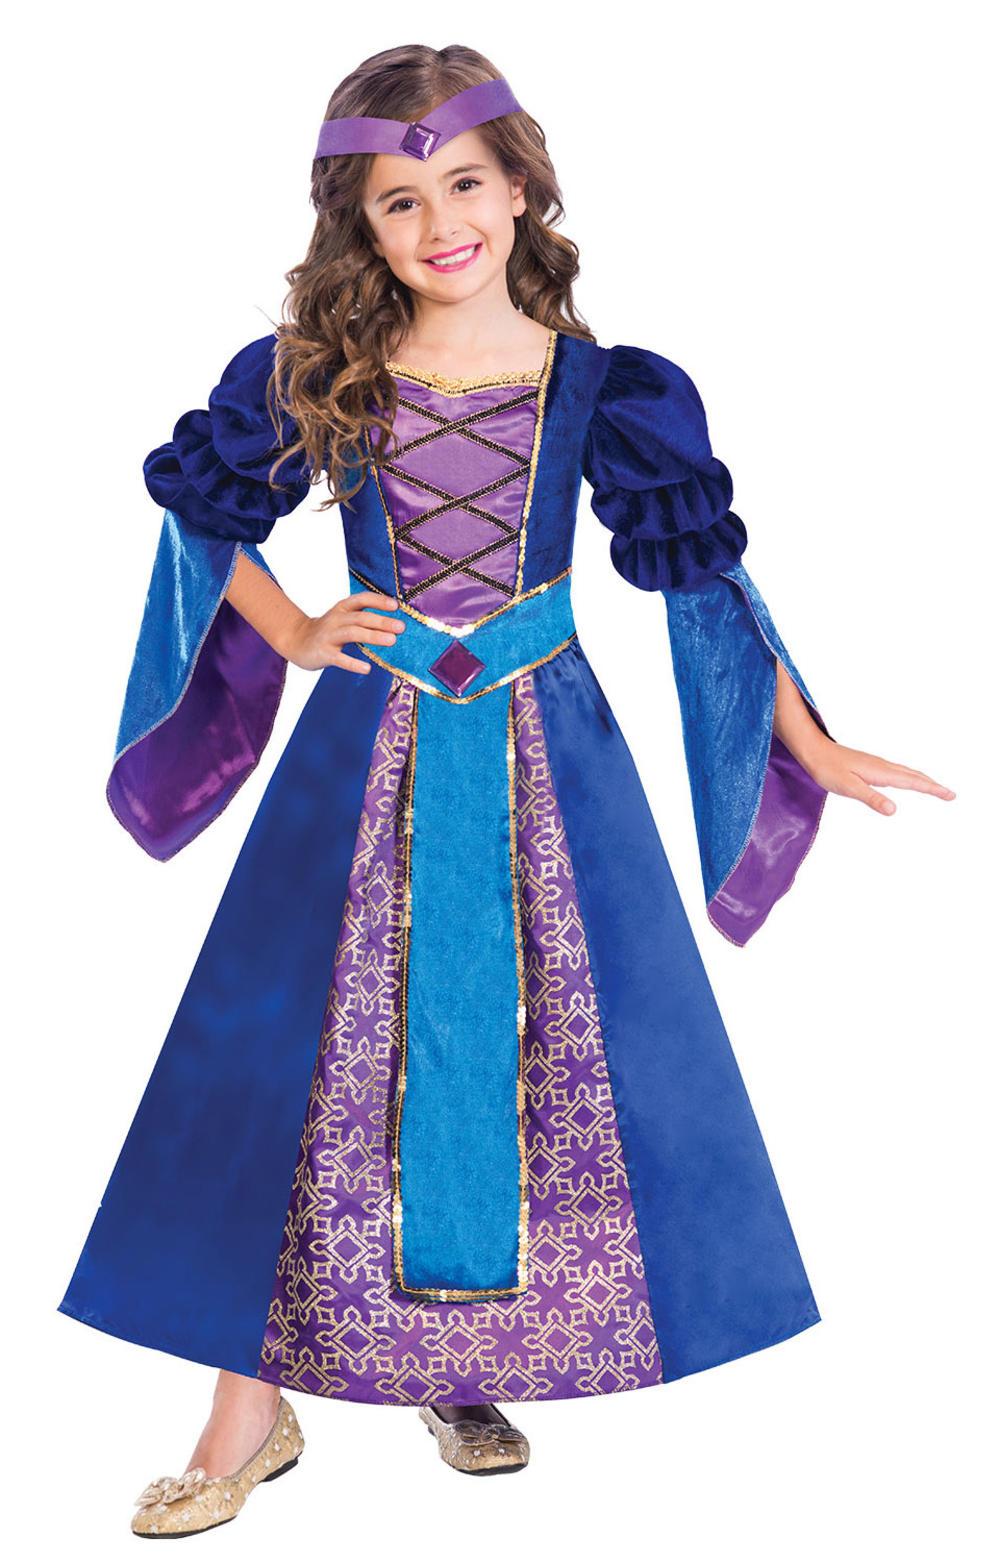 Medieval Princess Girls Fancy Dress Royal Tudor Kids World Book Day Costume